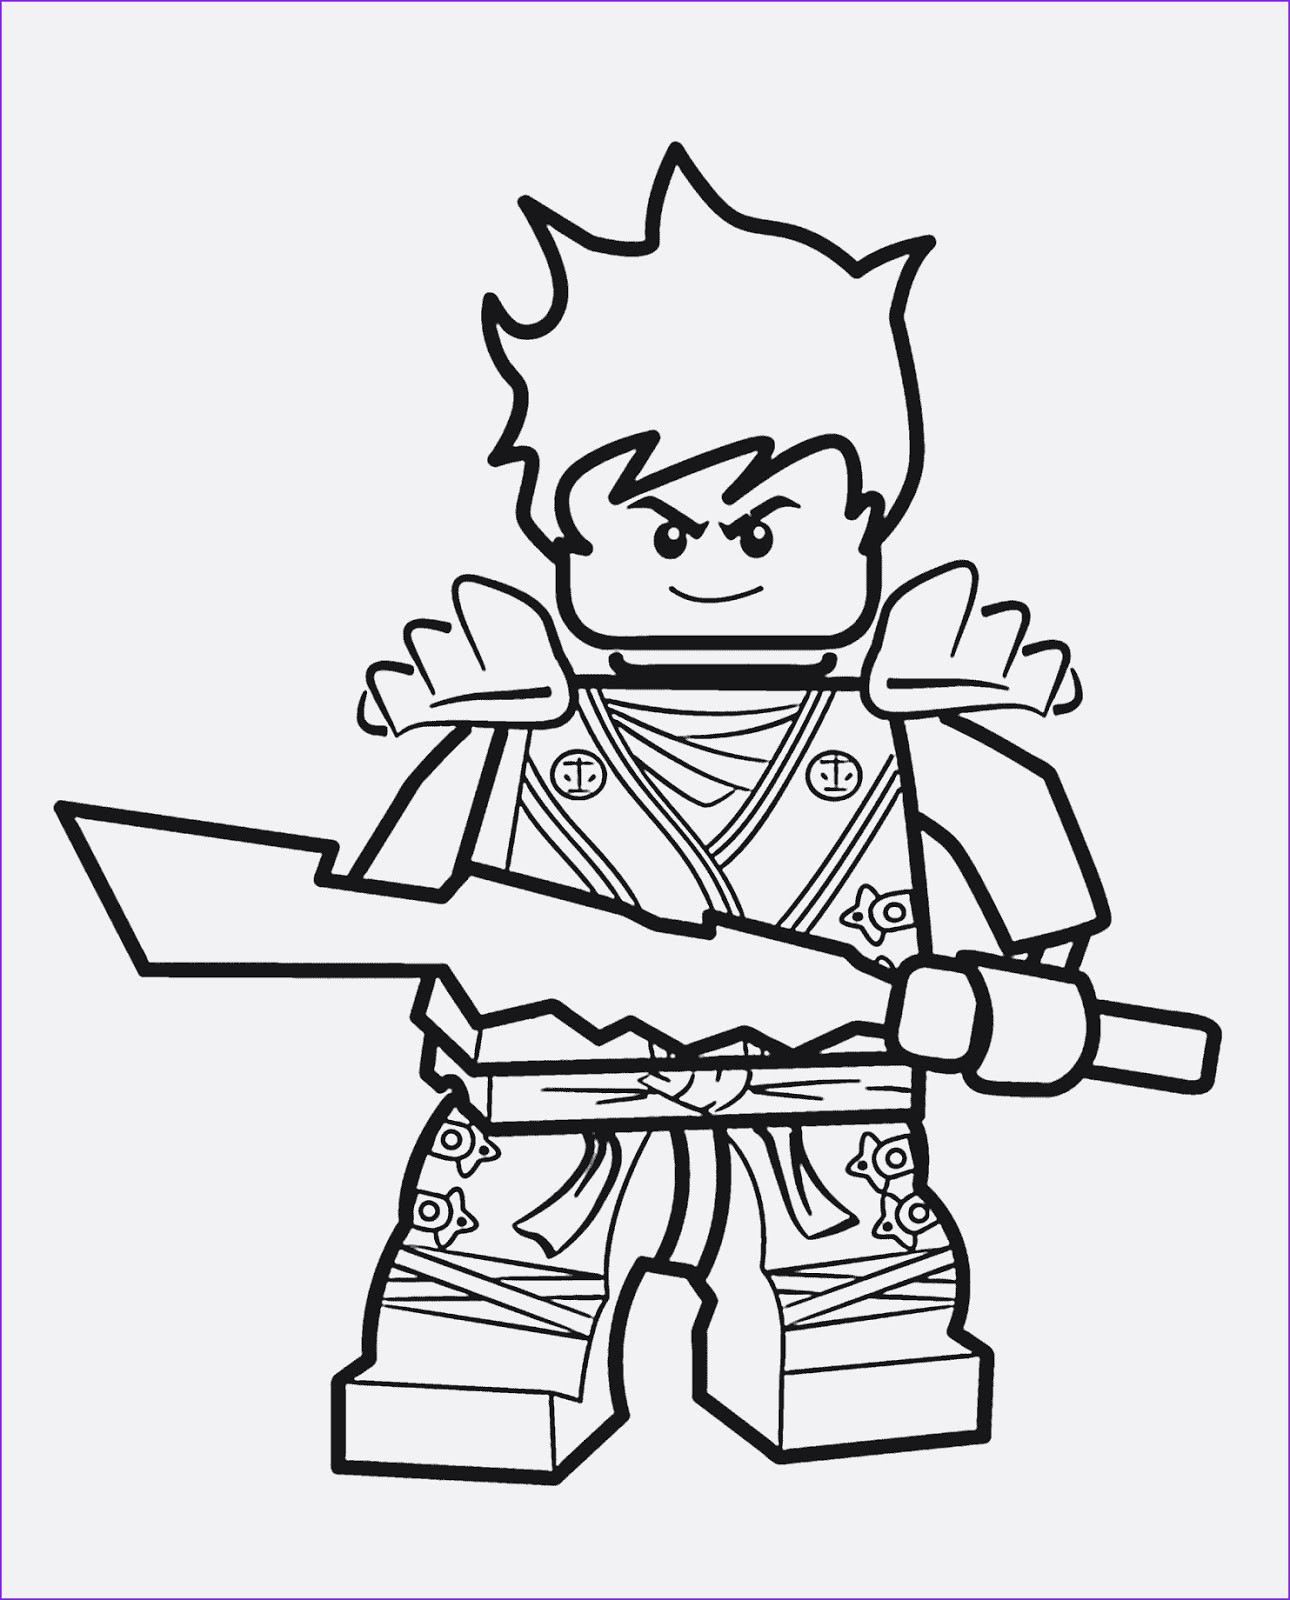 Ausmalbilder Ninjago Lloyd  Ausmalbilder Lego Ninjago Lego Ninjago zum Ausmalen